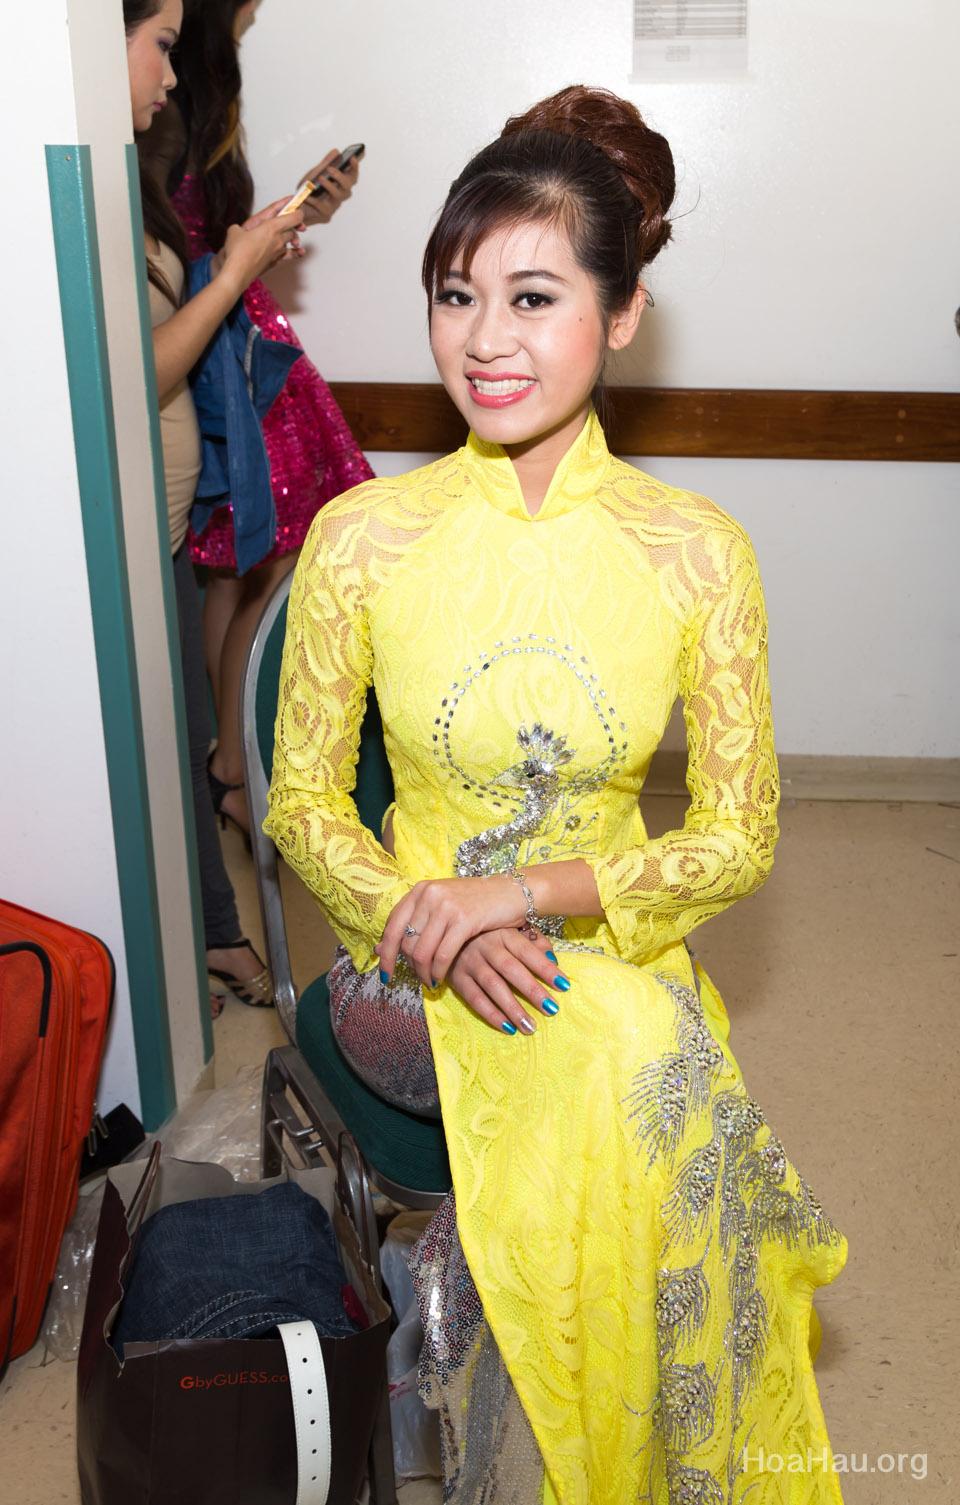 tram nho ngan thuong 2013 - Image 219